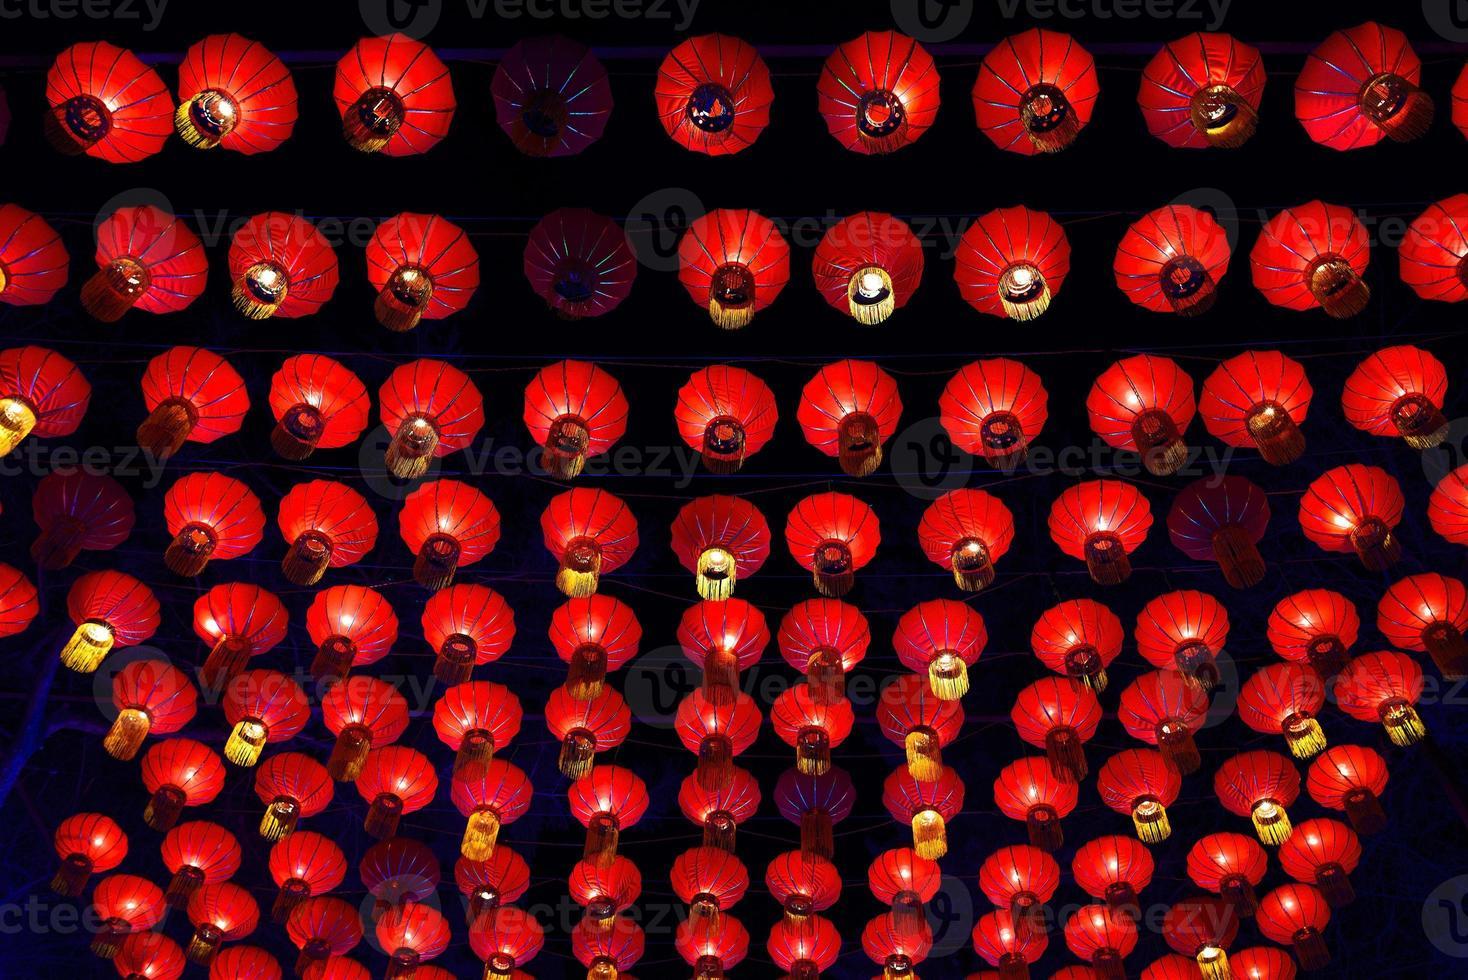 Chinese lantaarn foto